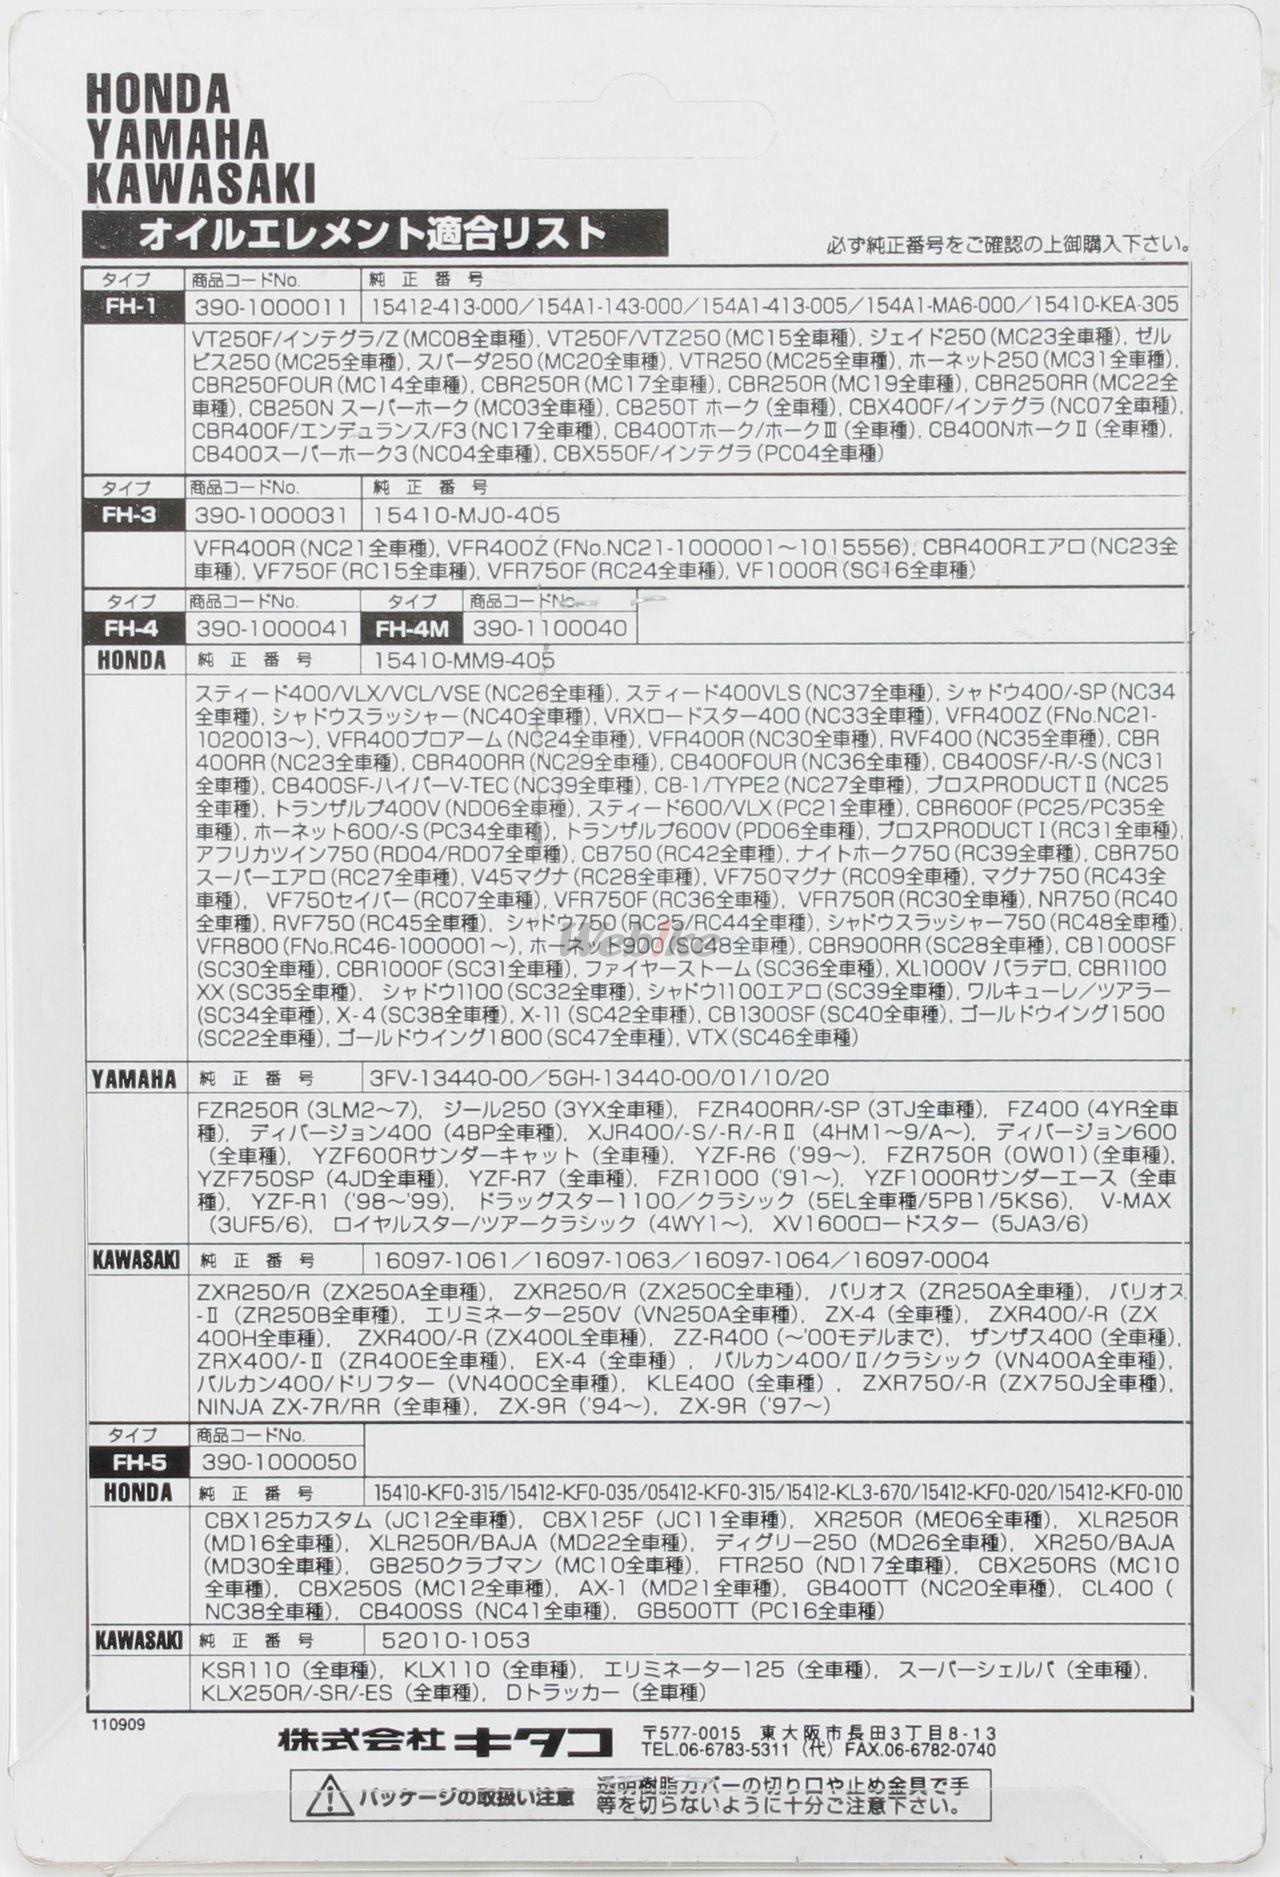 【KITACO】機油濾芯 FH-5 - 「Webike-摩托百貨」